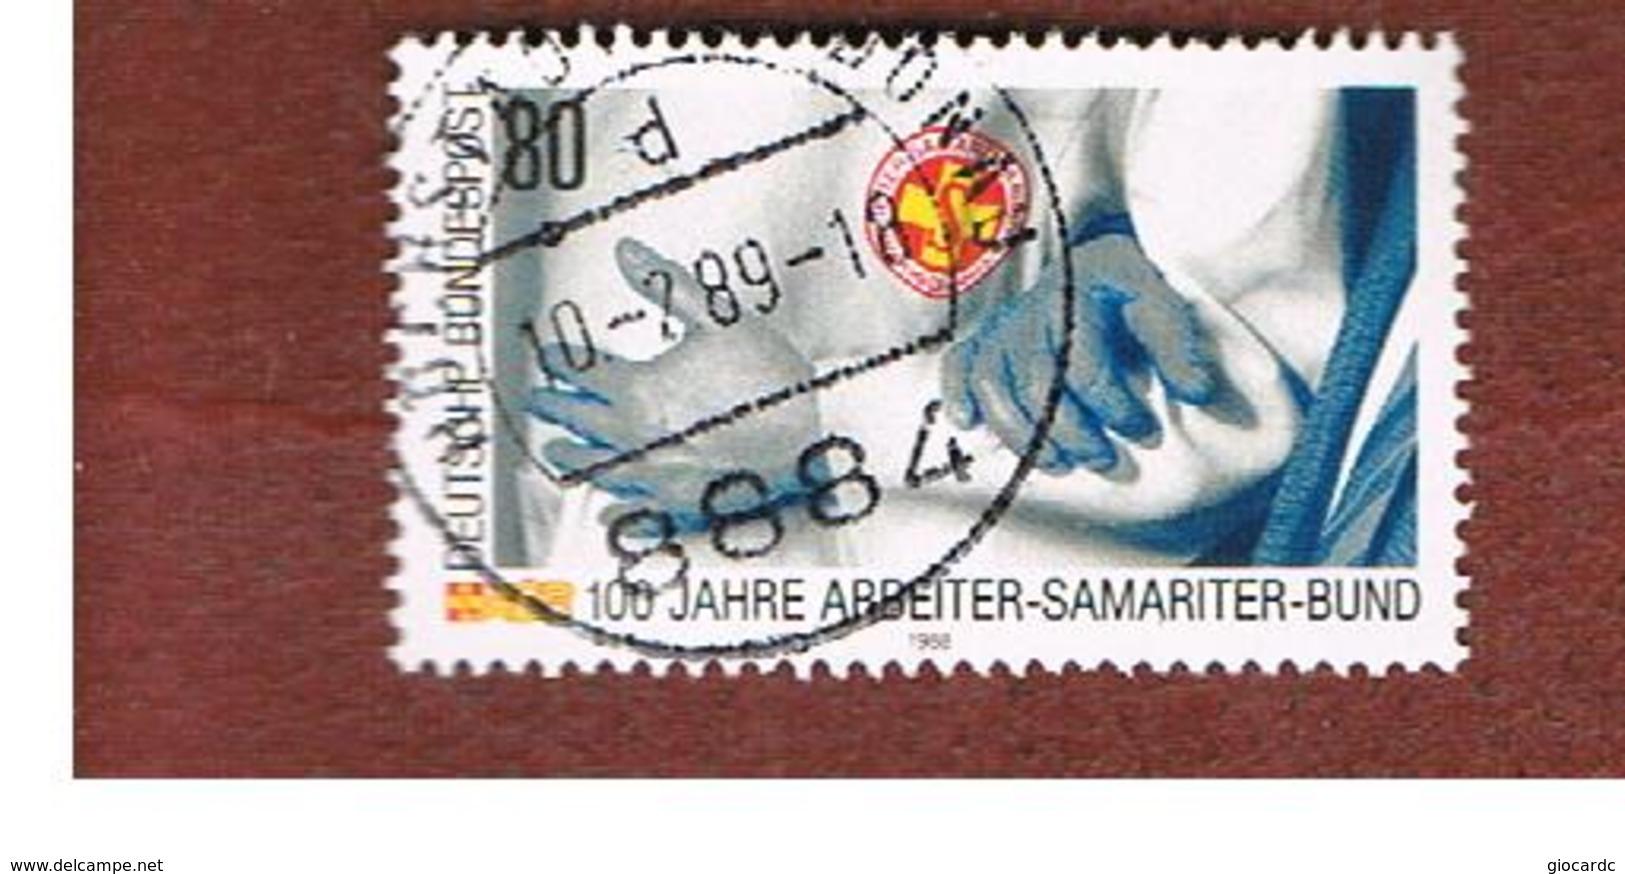 GERMANIA (GERMANY) - SG 2259 - 1988 SAMARITAN WORKERS' ASSOCIATION      - USED - [7] République Fédérale